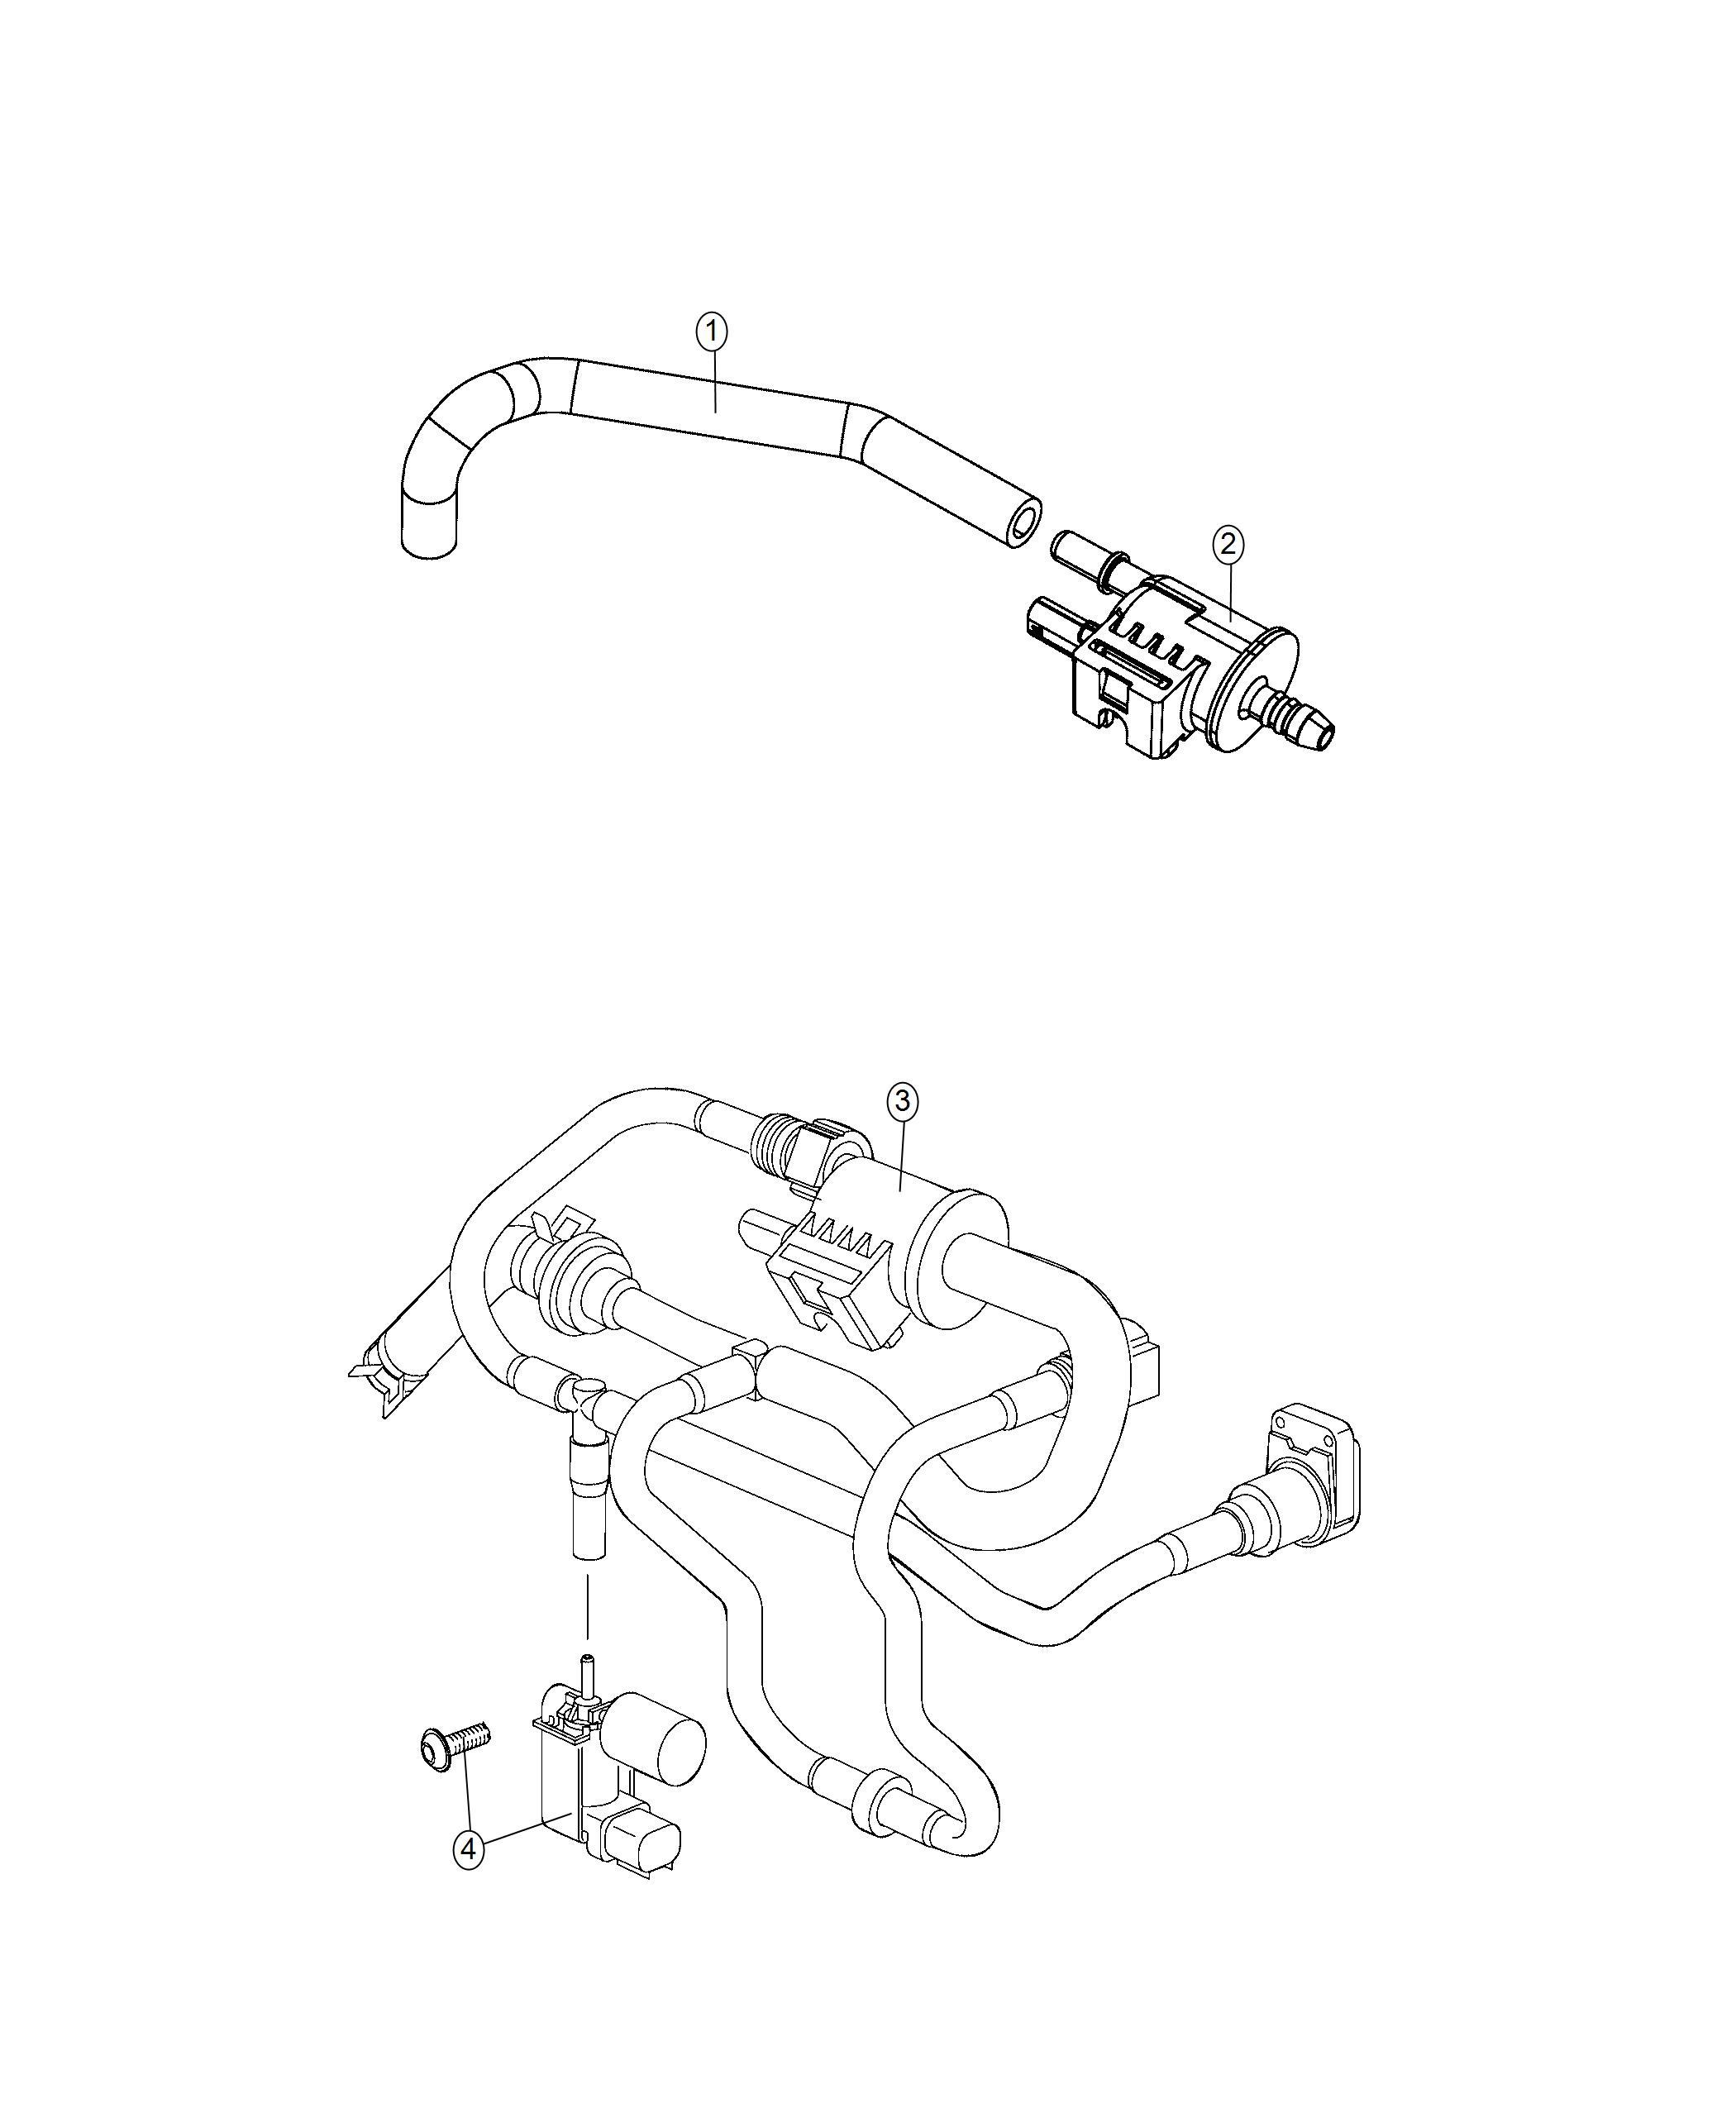 Jeep Renegade Solenoid Electronic Valve